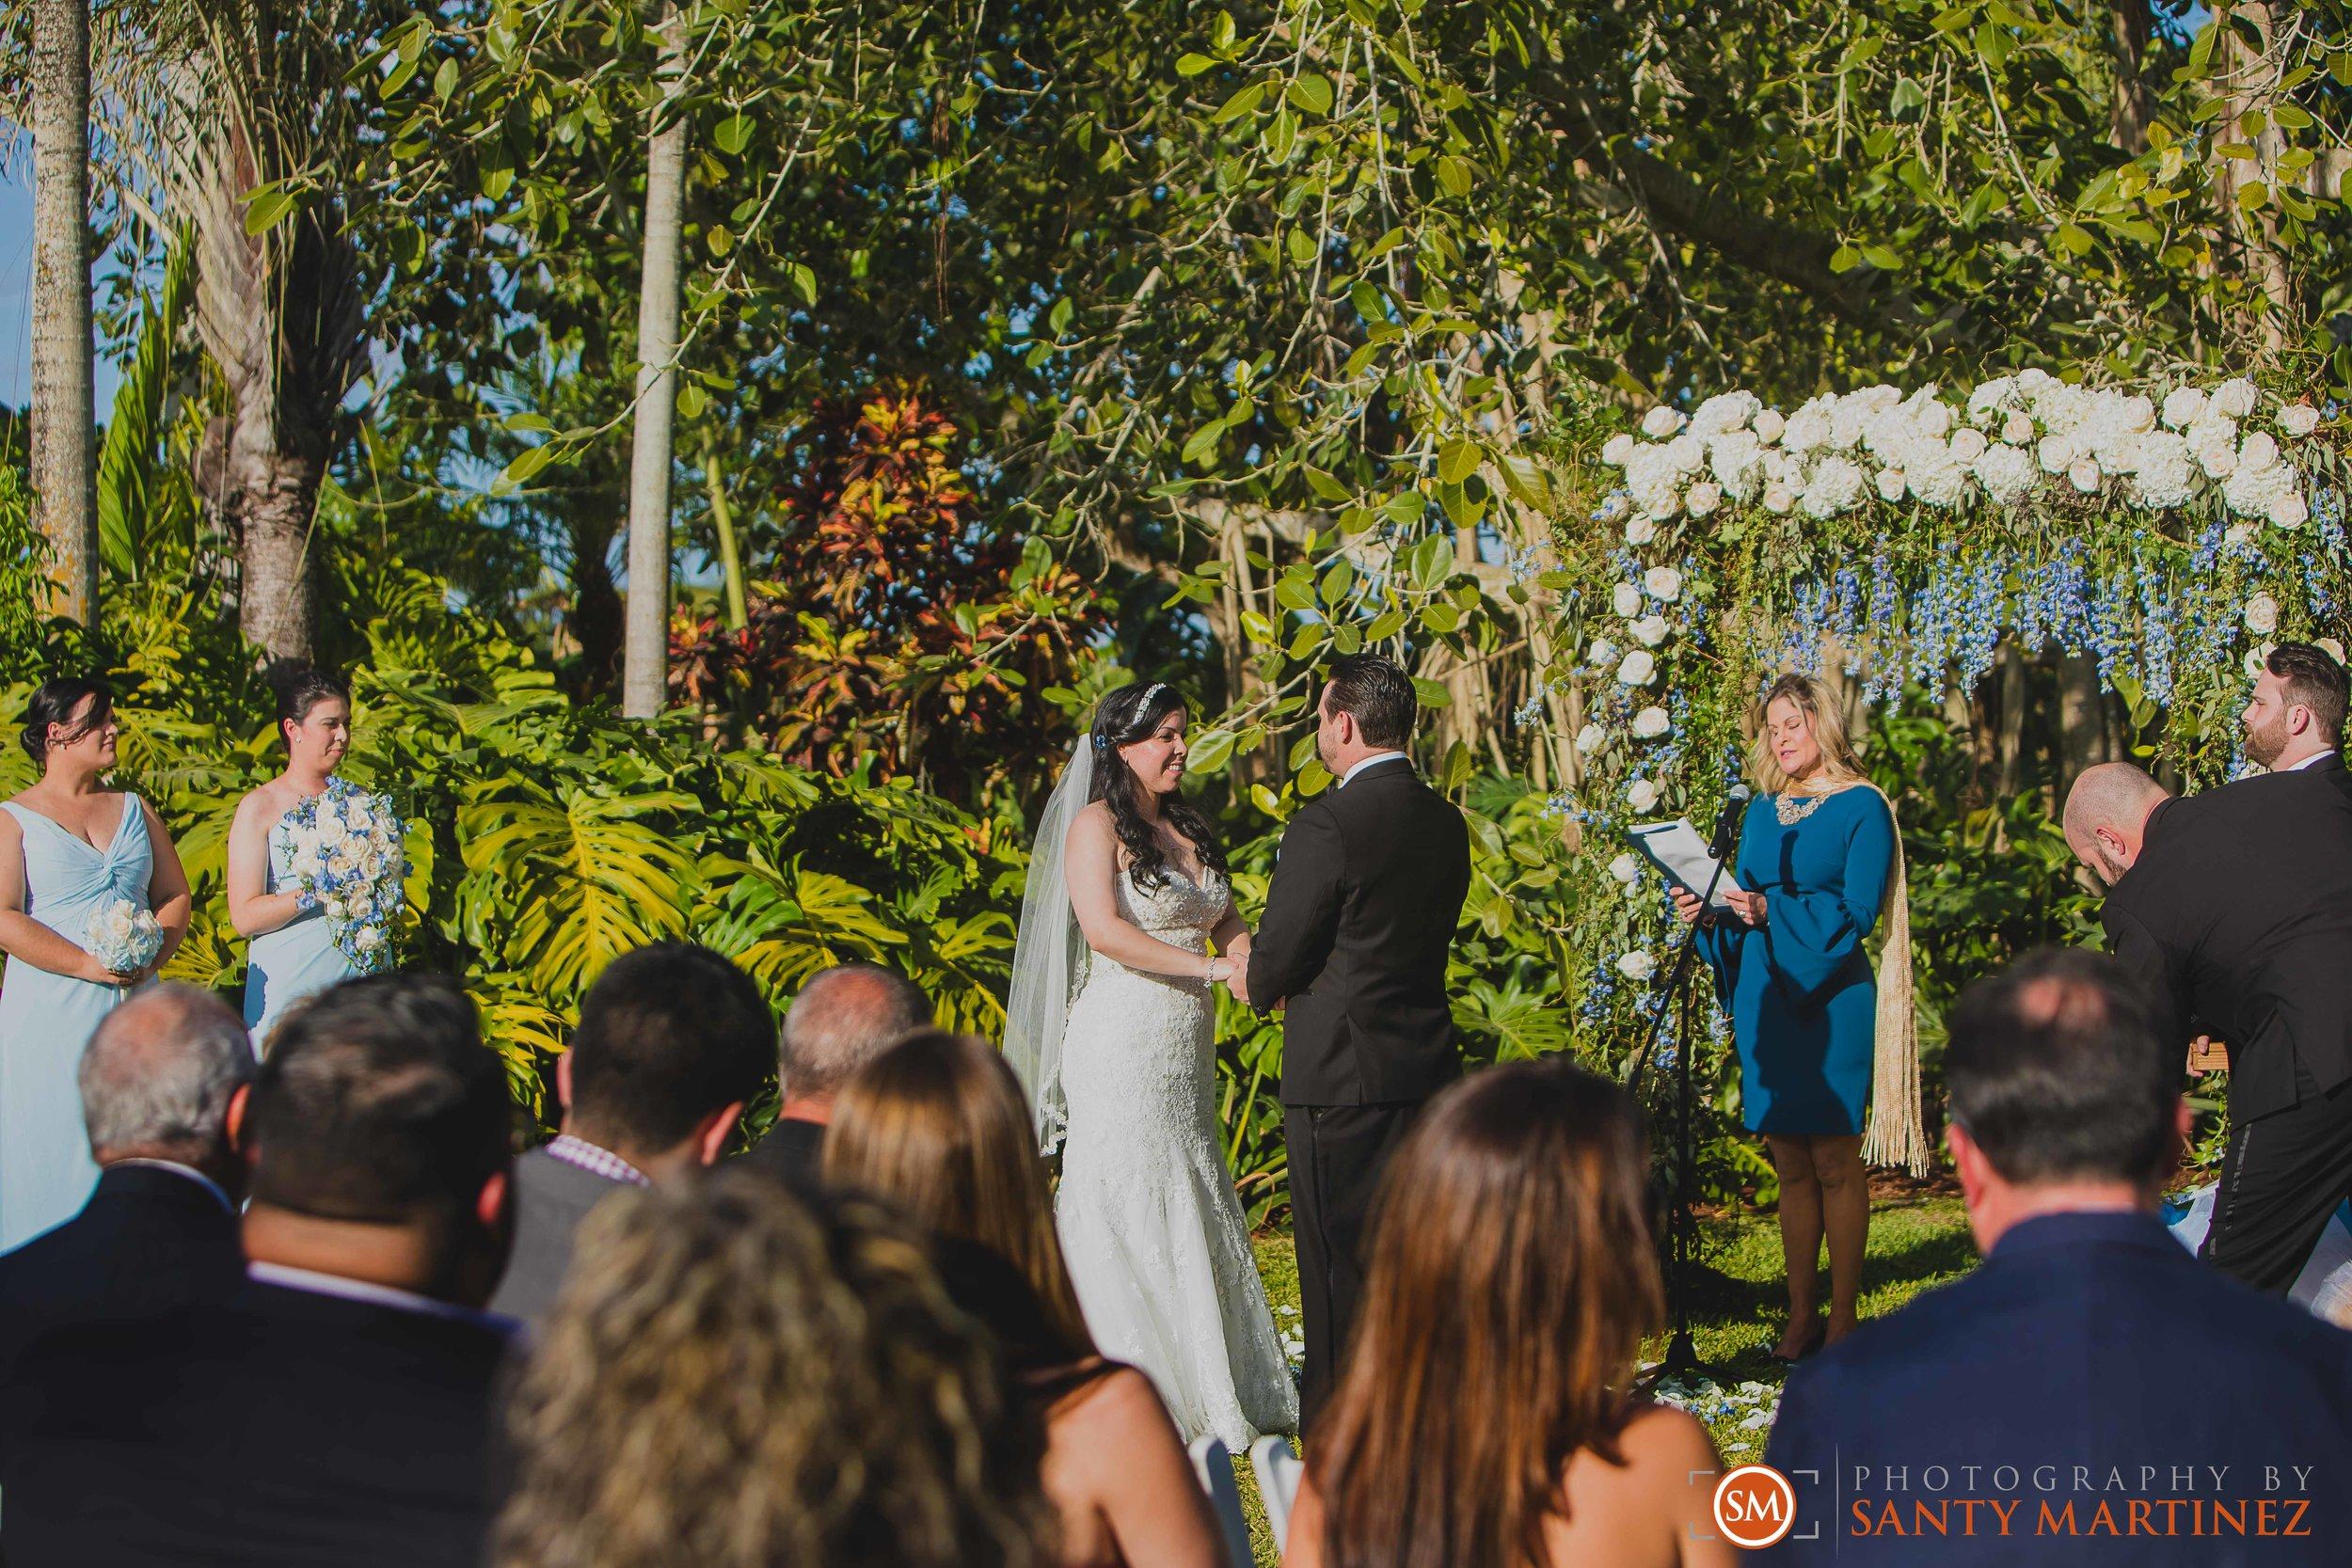 Wedding - Whimsical key West House - Photography by Santy Martinez-20.jpg